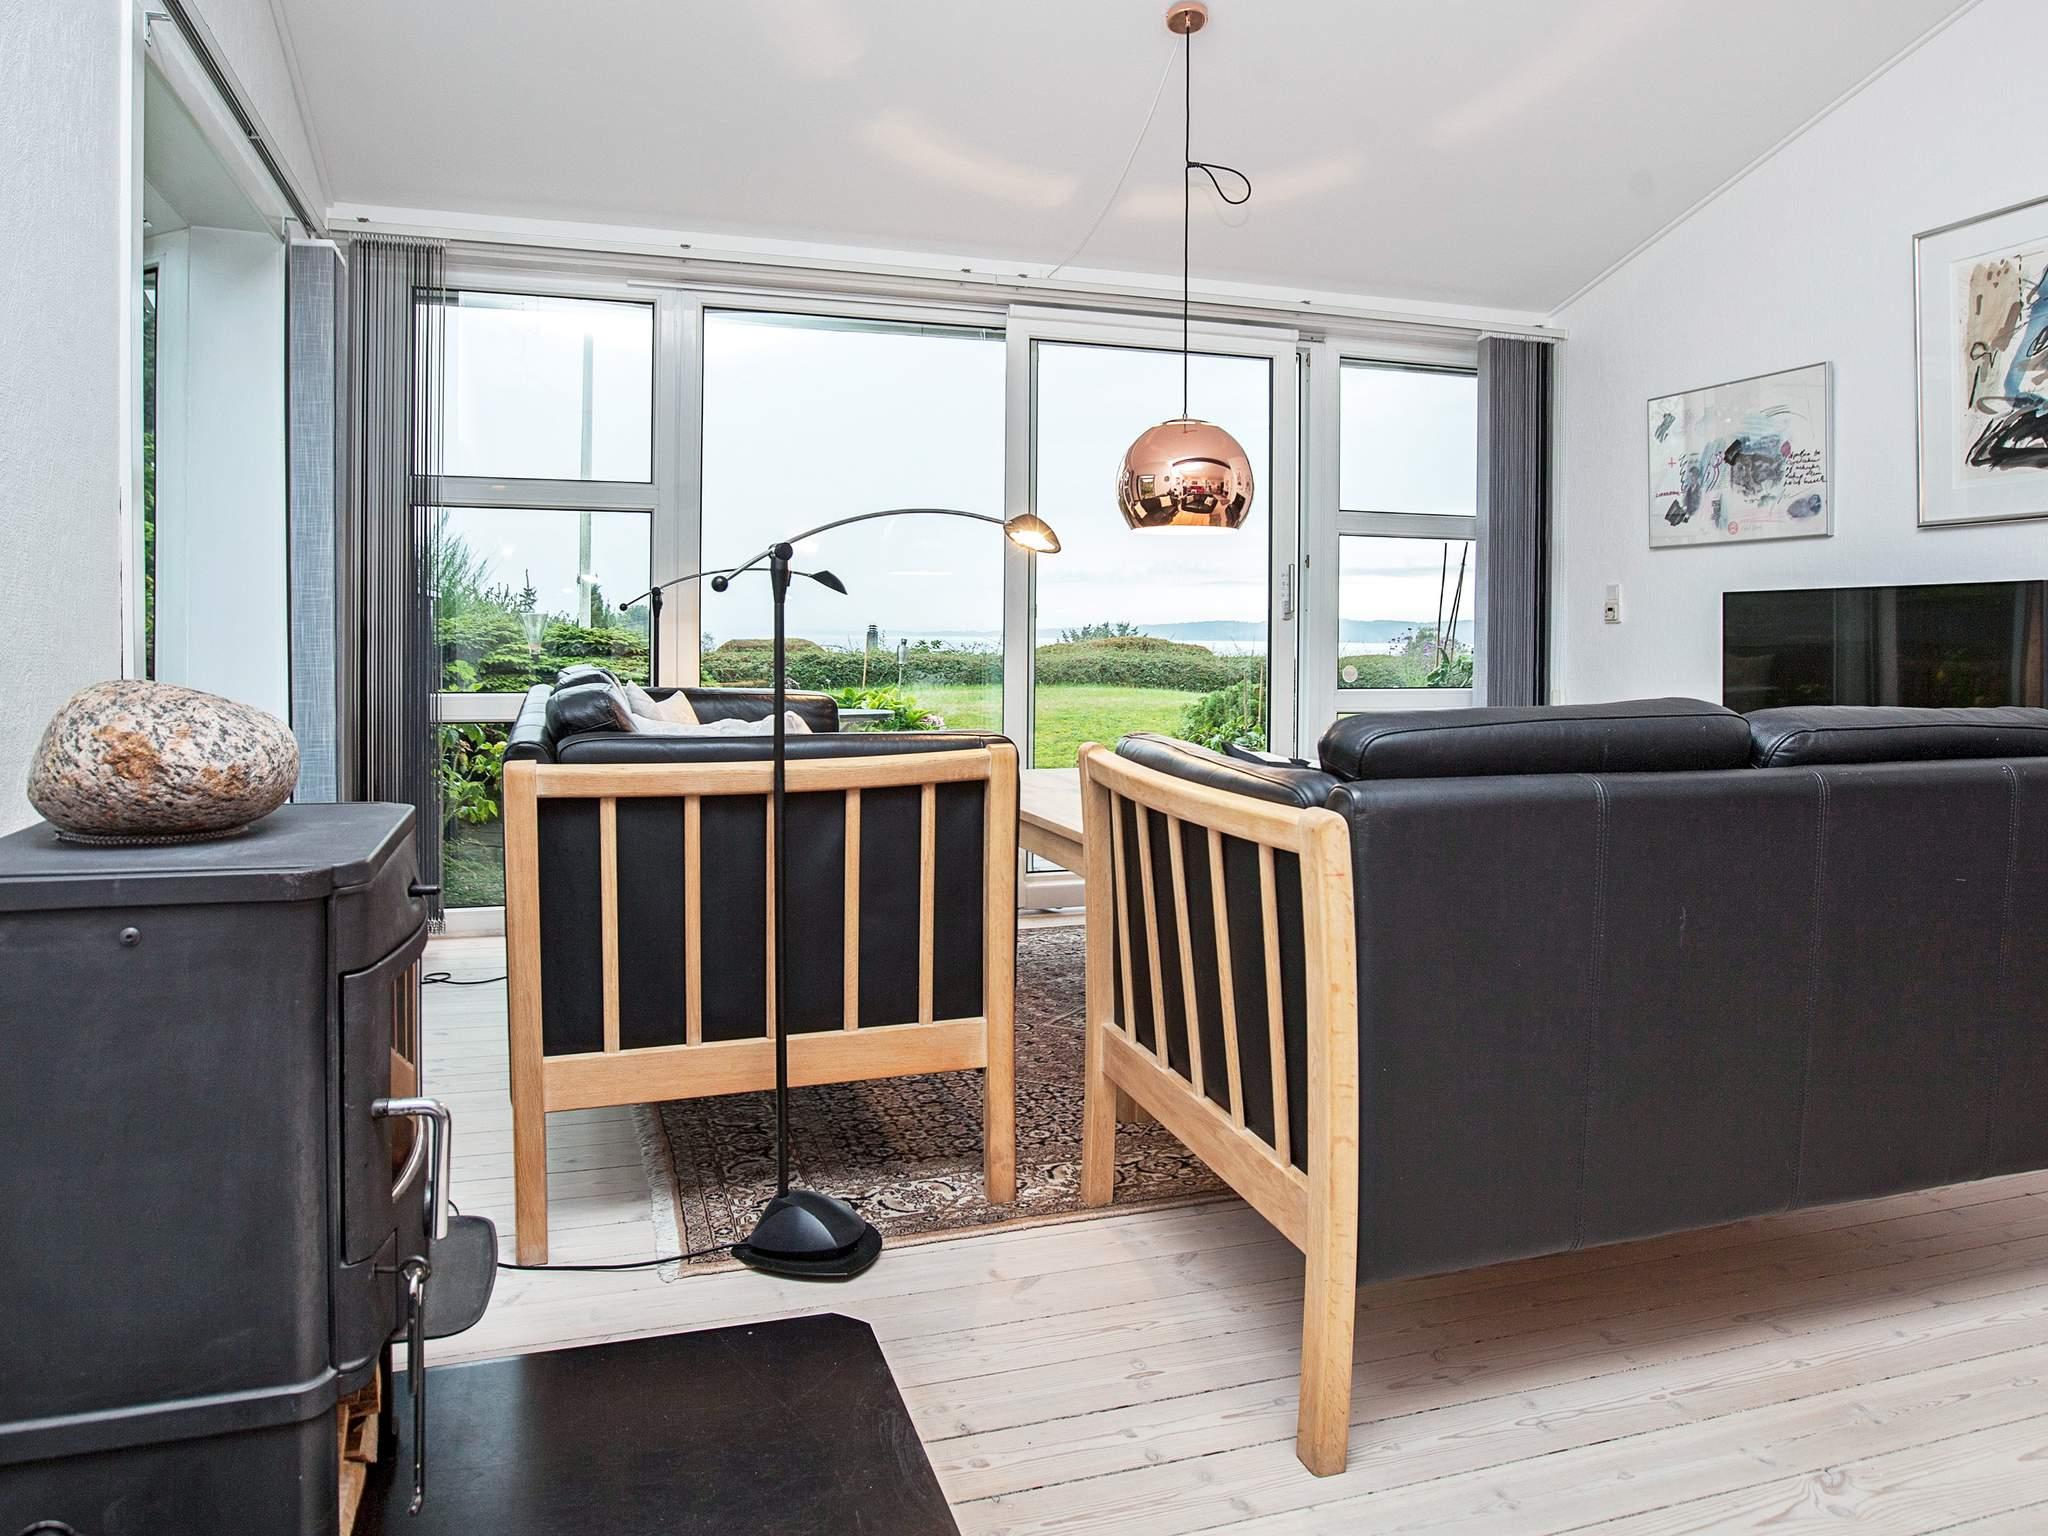 Ferienhaus Lyngsbæk Strand (456410), Ebeltoft, , Ostjütland, Dänemark, Bild 3